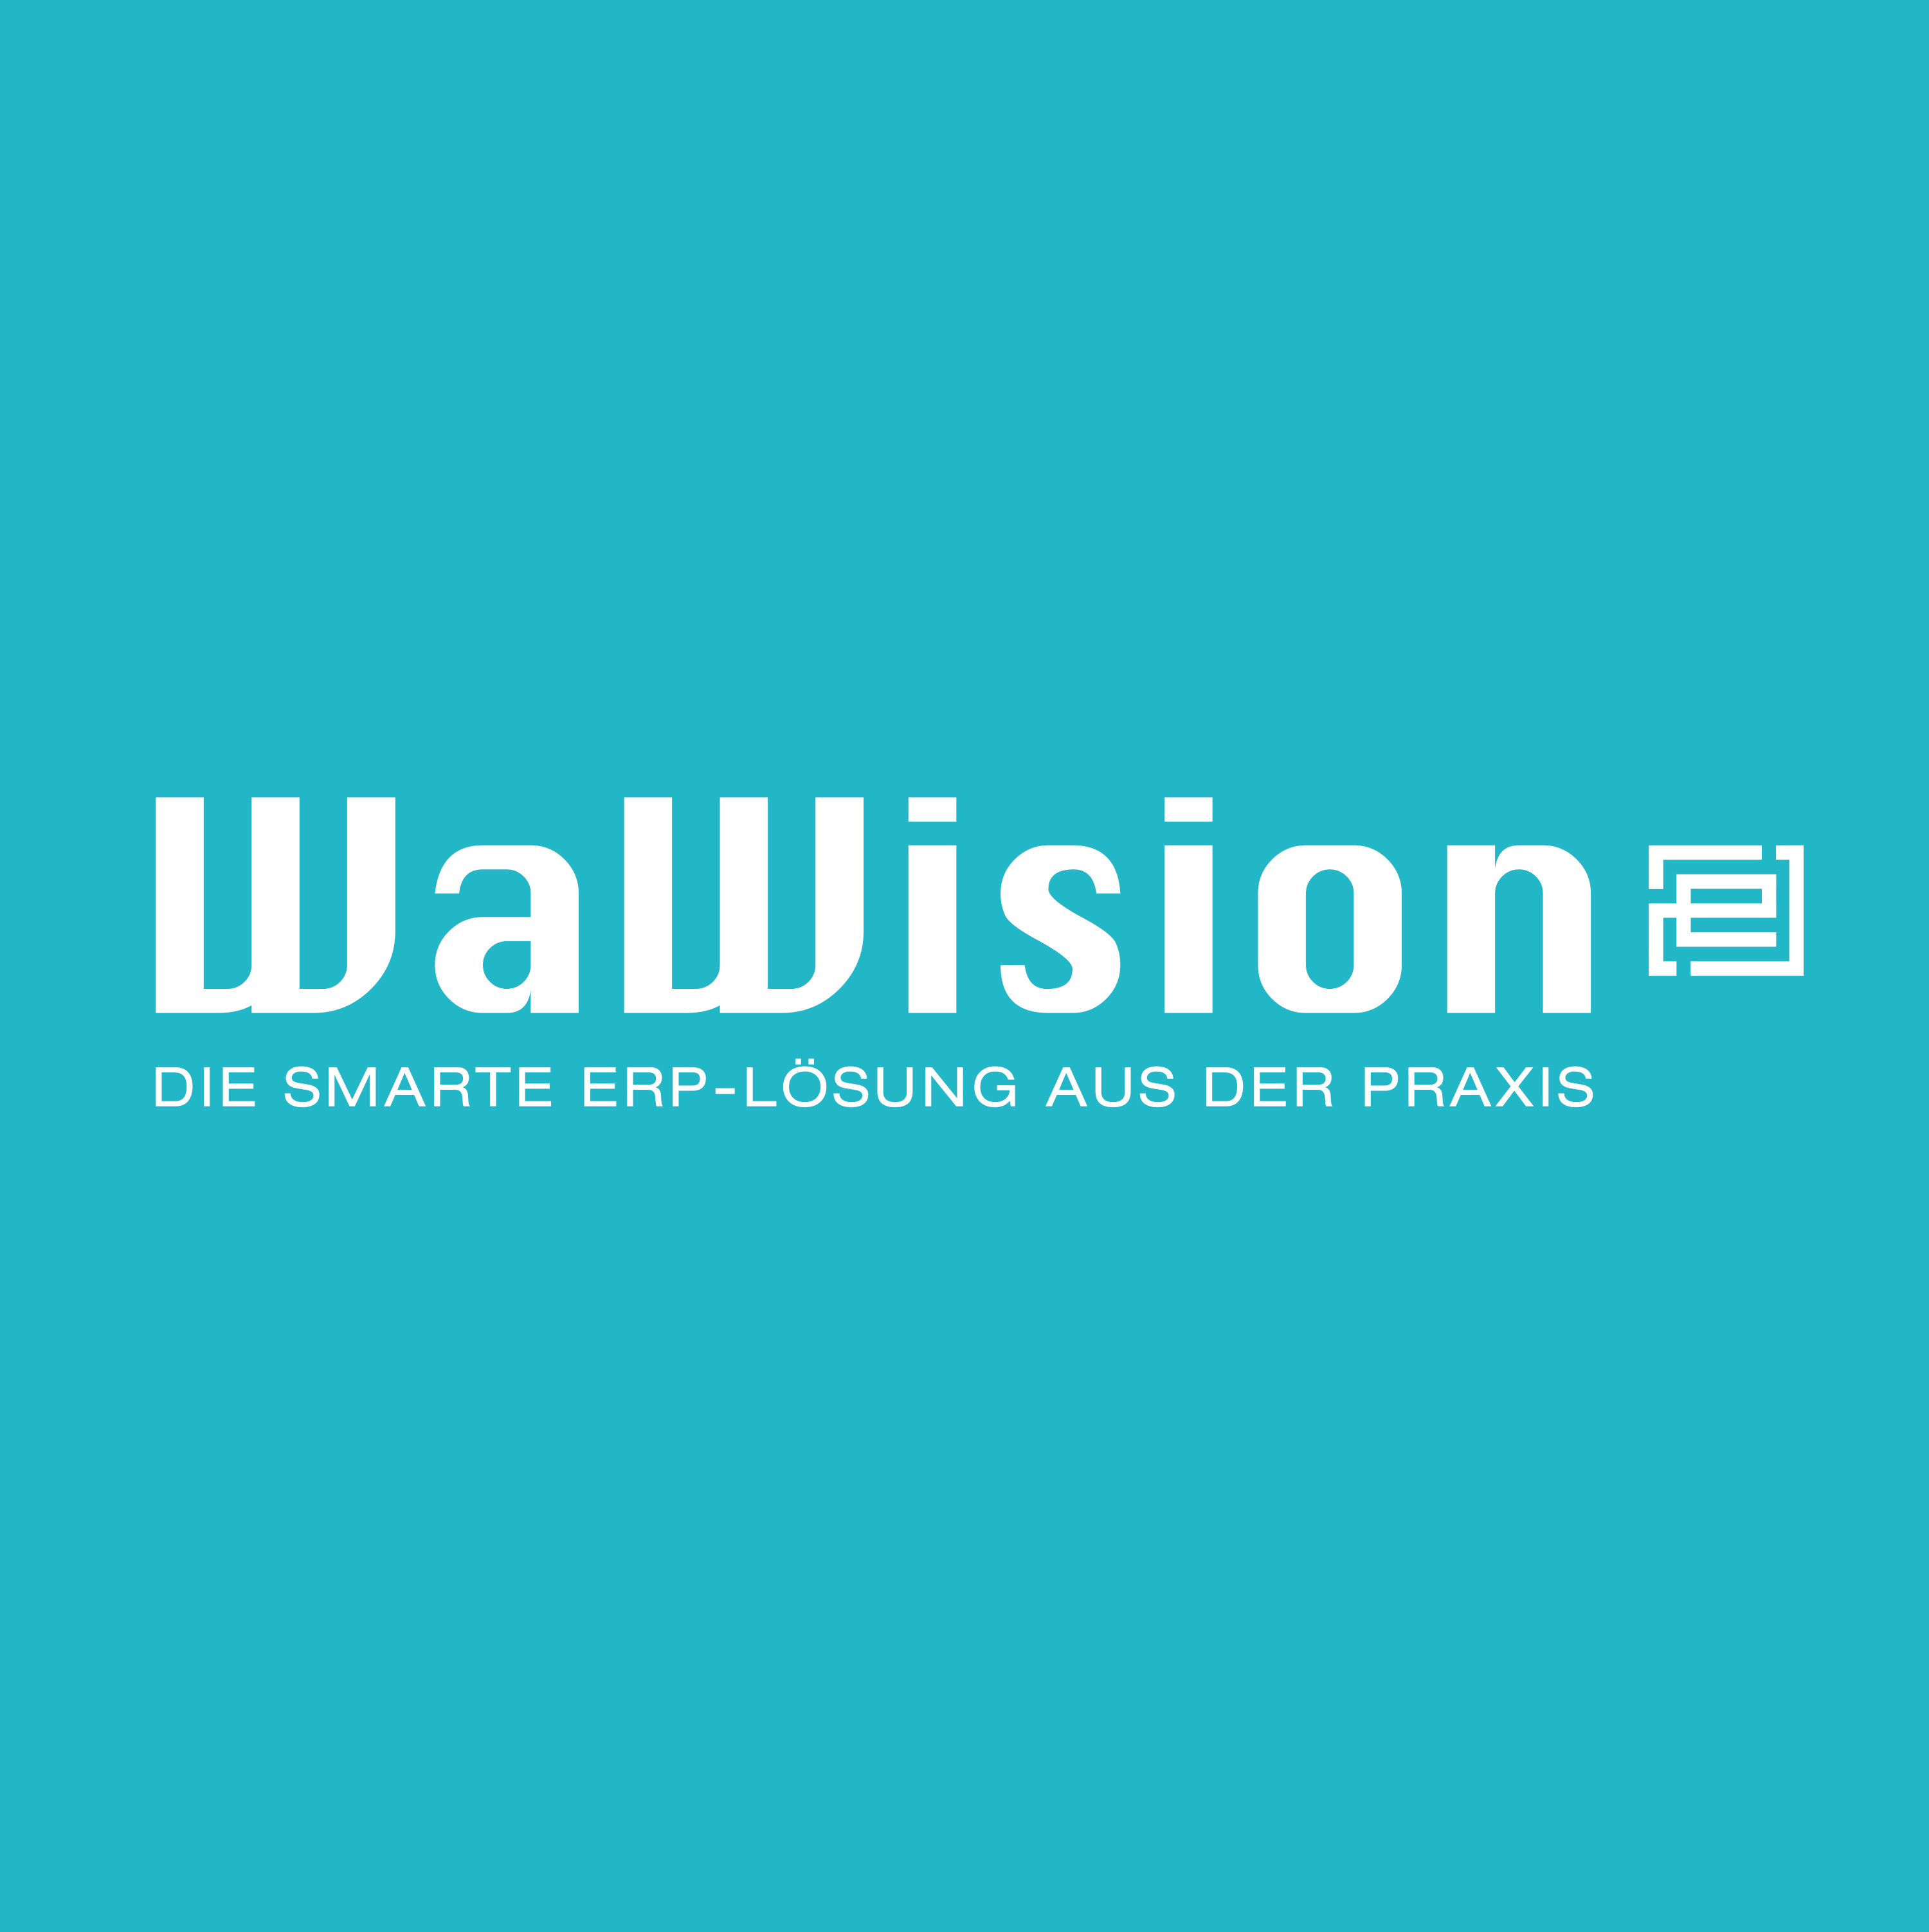 WaWision GmbH